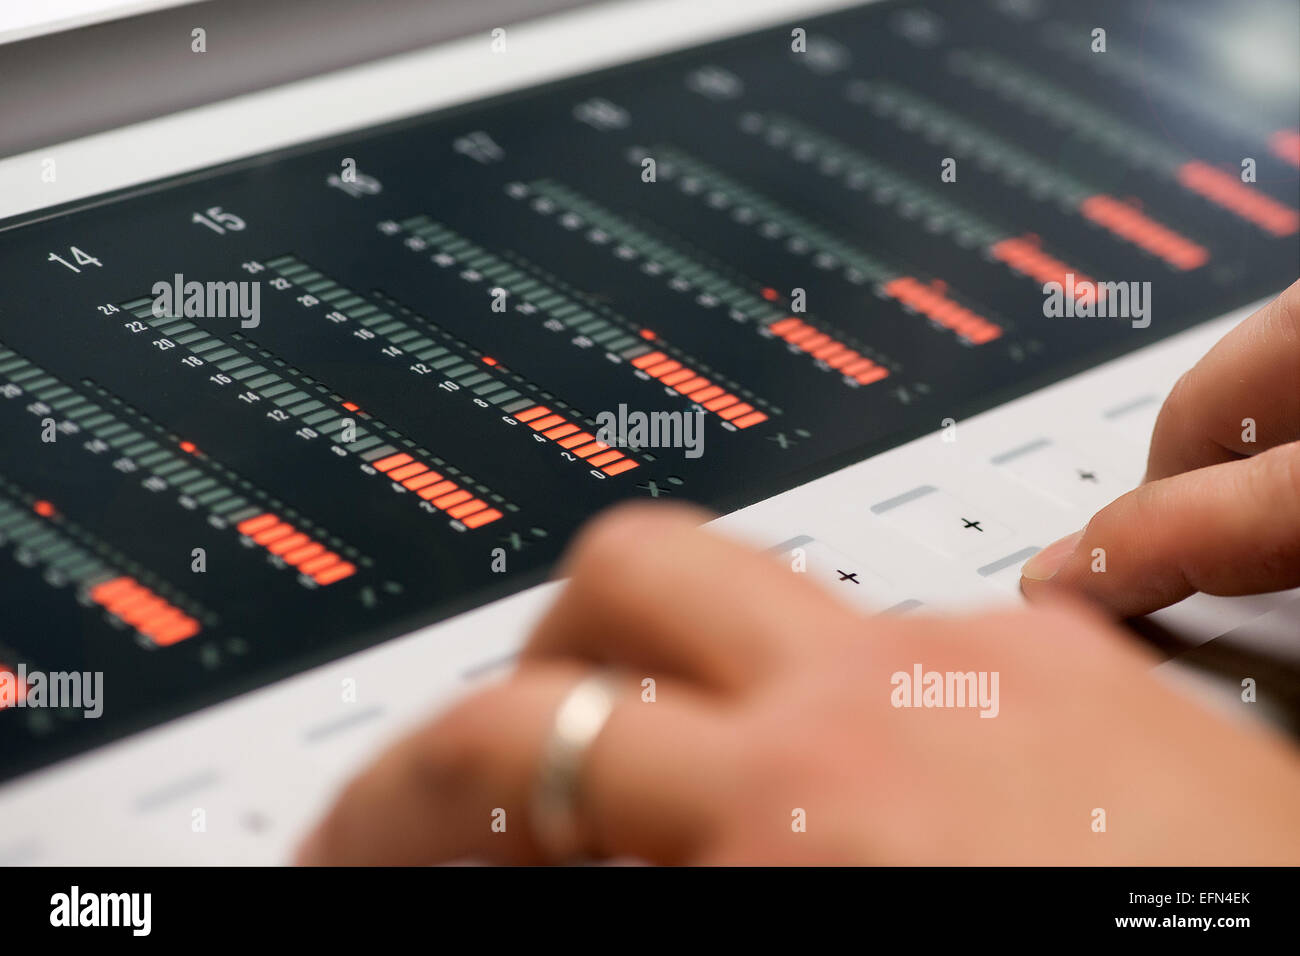 Close up Man Hand Operating a Modern Digital Printing Mixer Machine - Stock Image